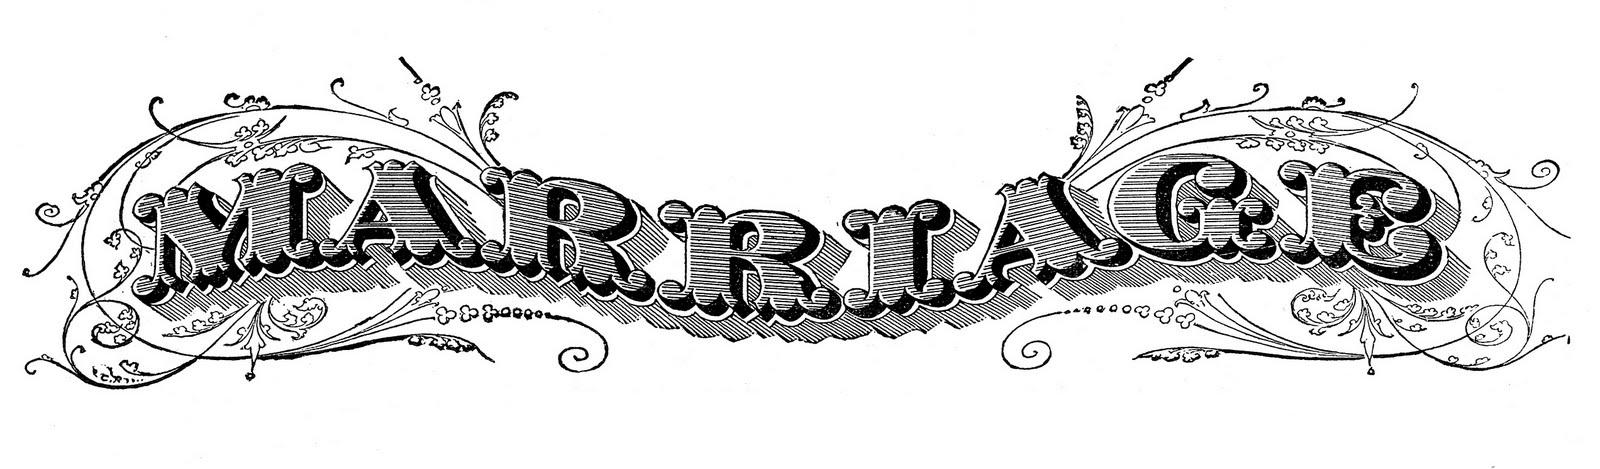 Antique Ephemera Clip Art - Printable Marriage Certificate - The ... graphic transparent library